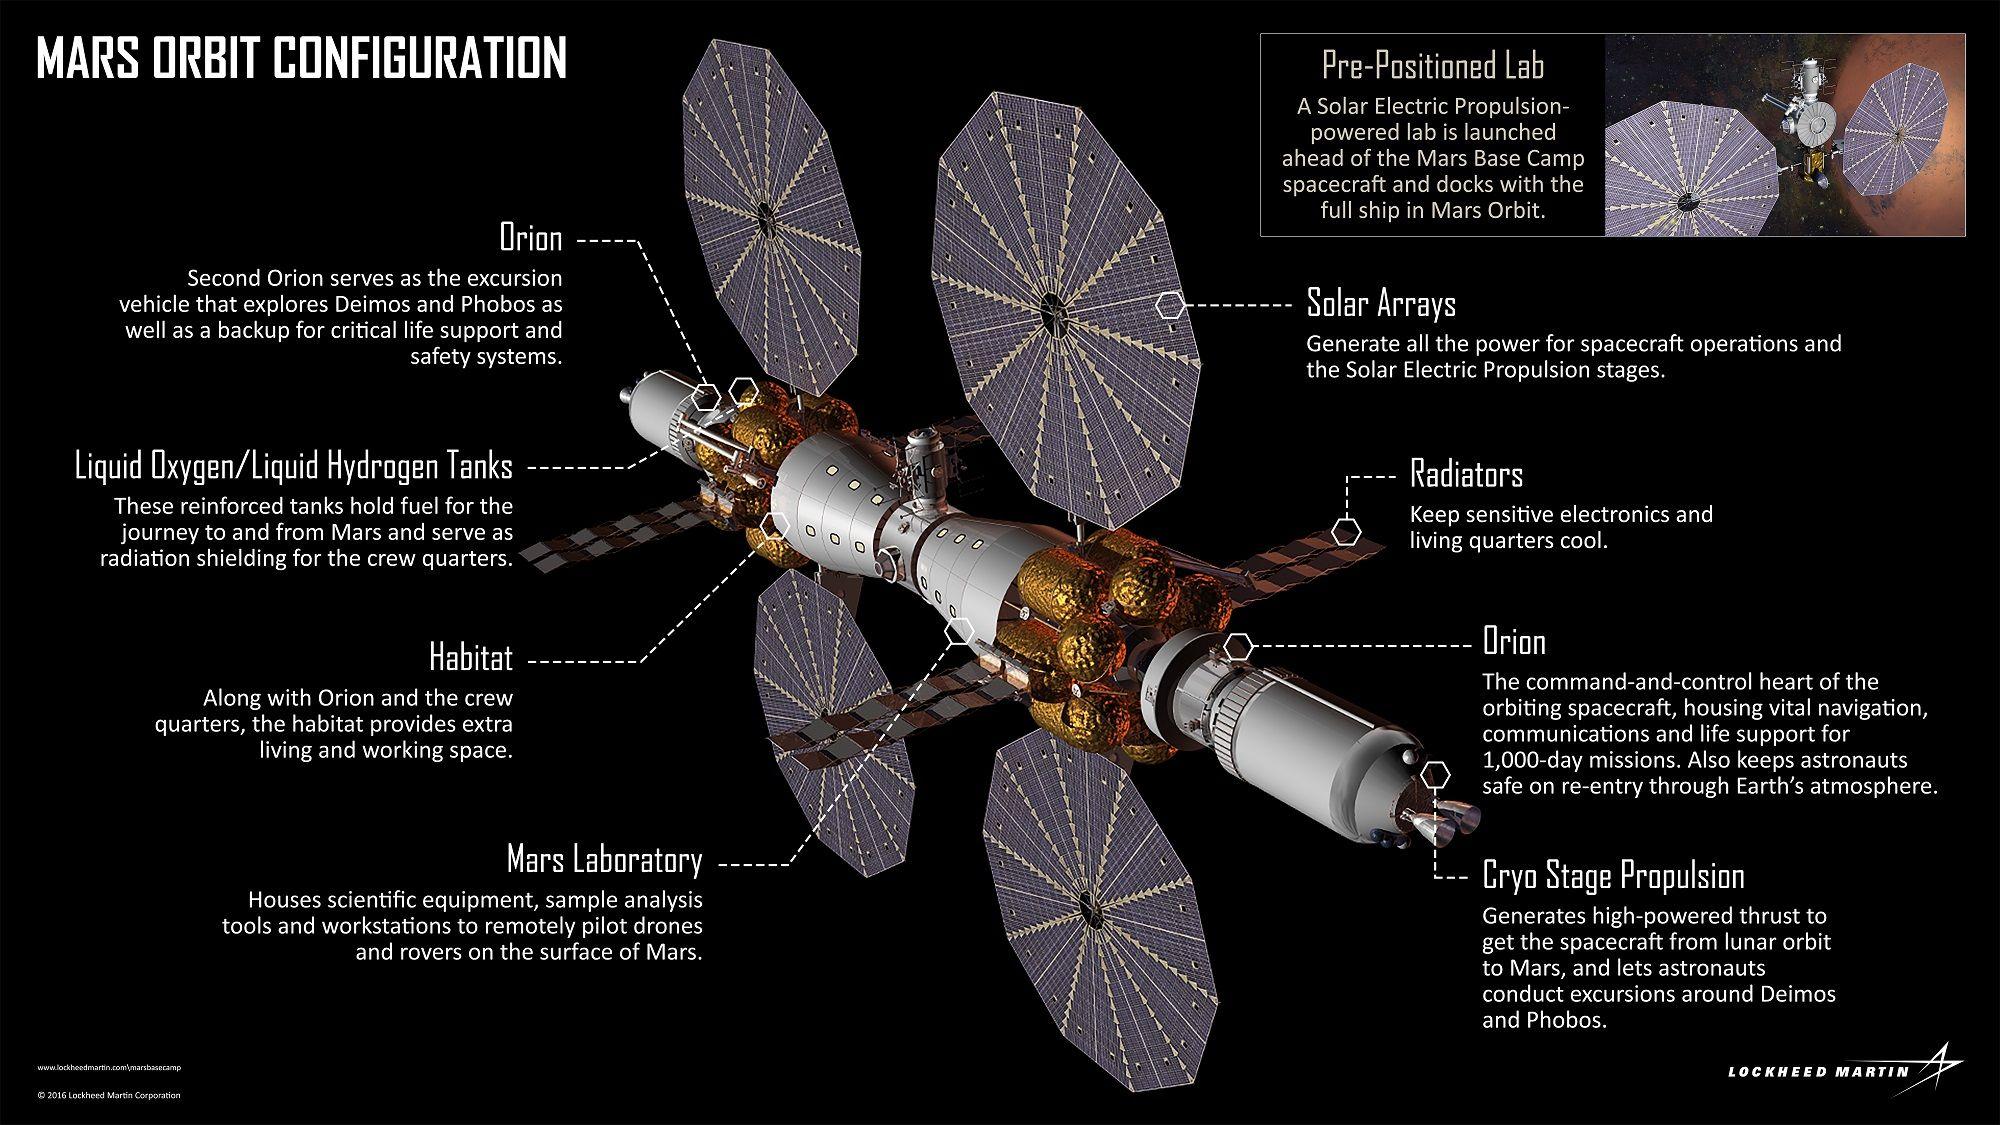 Mars orbit configuration